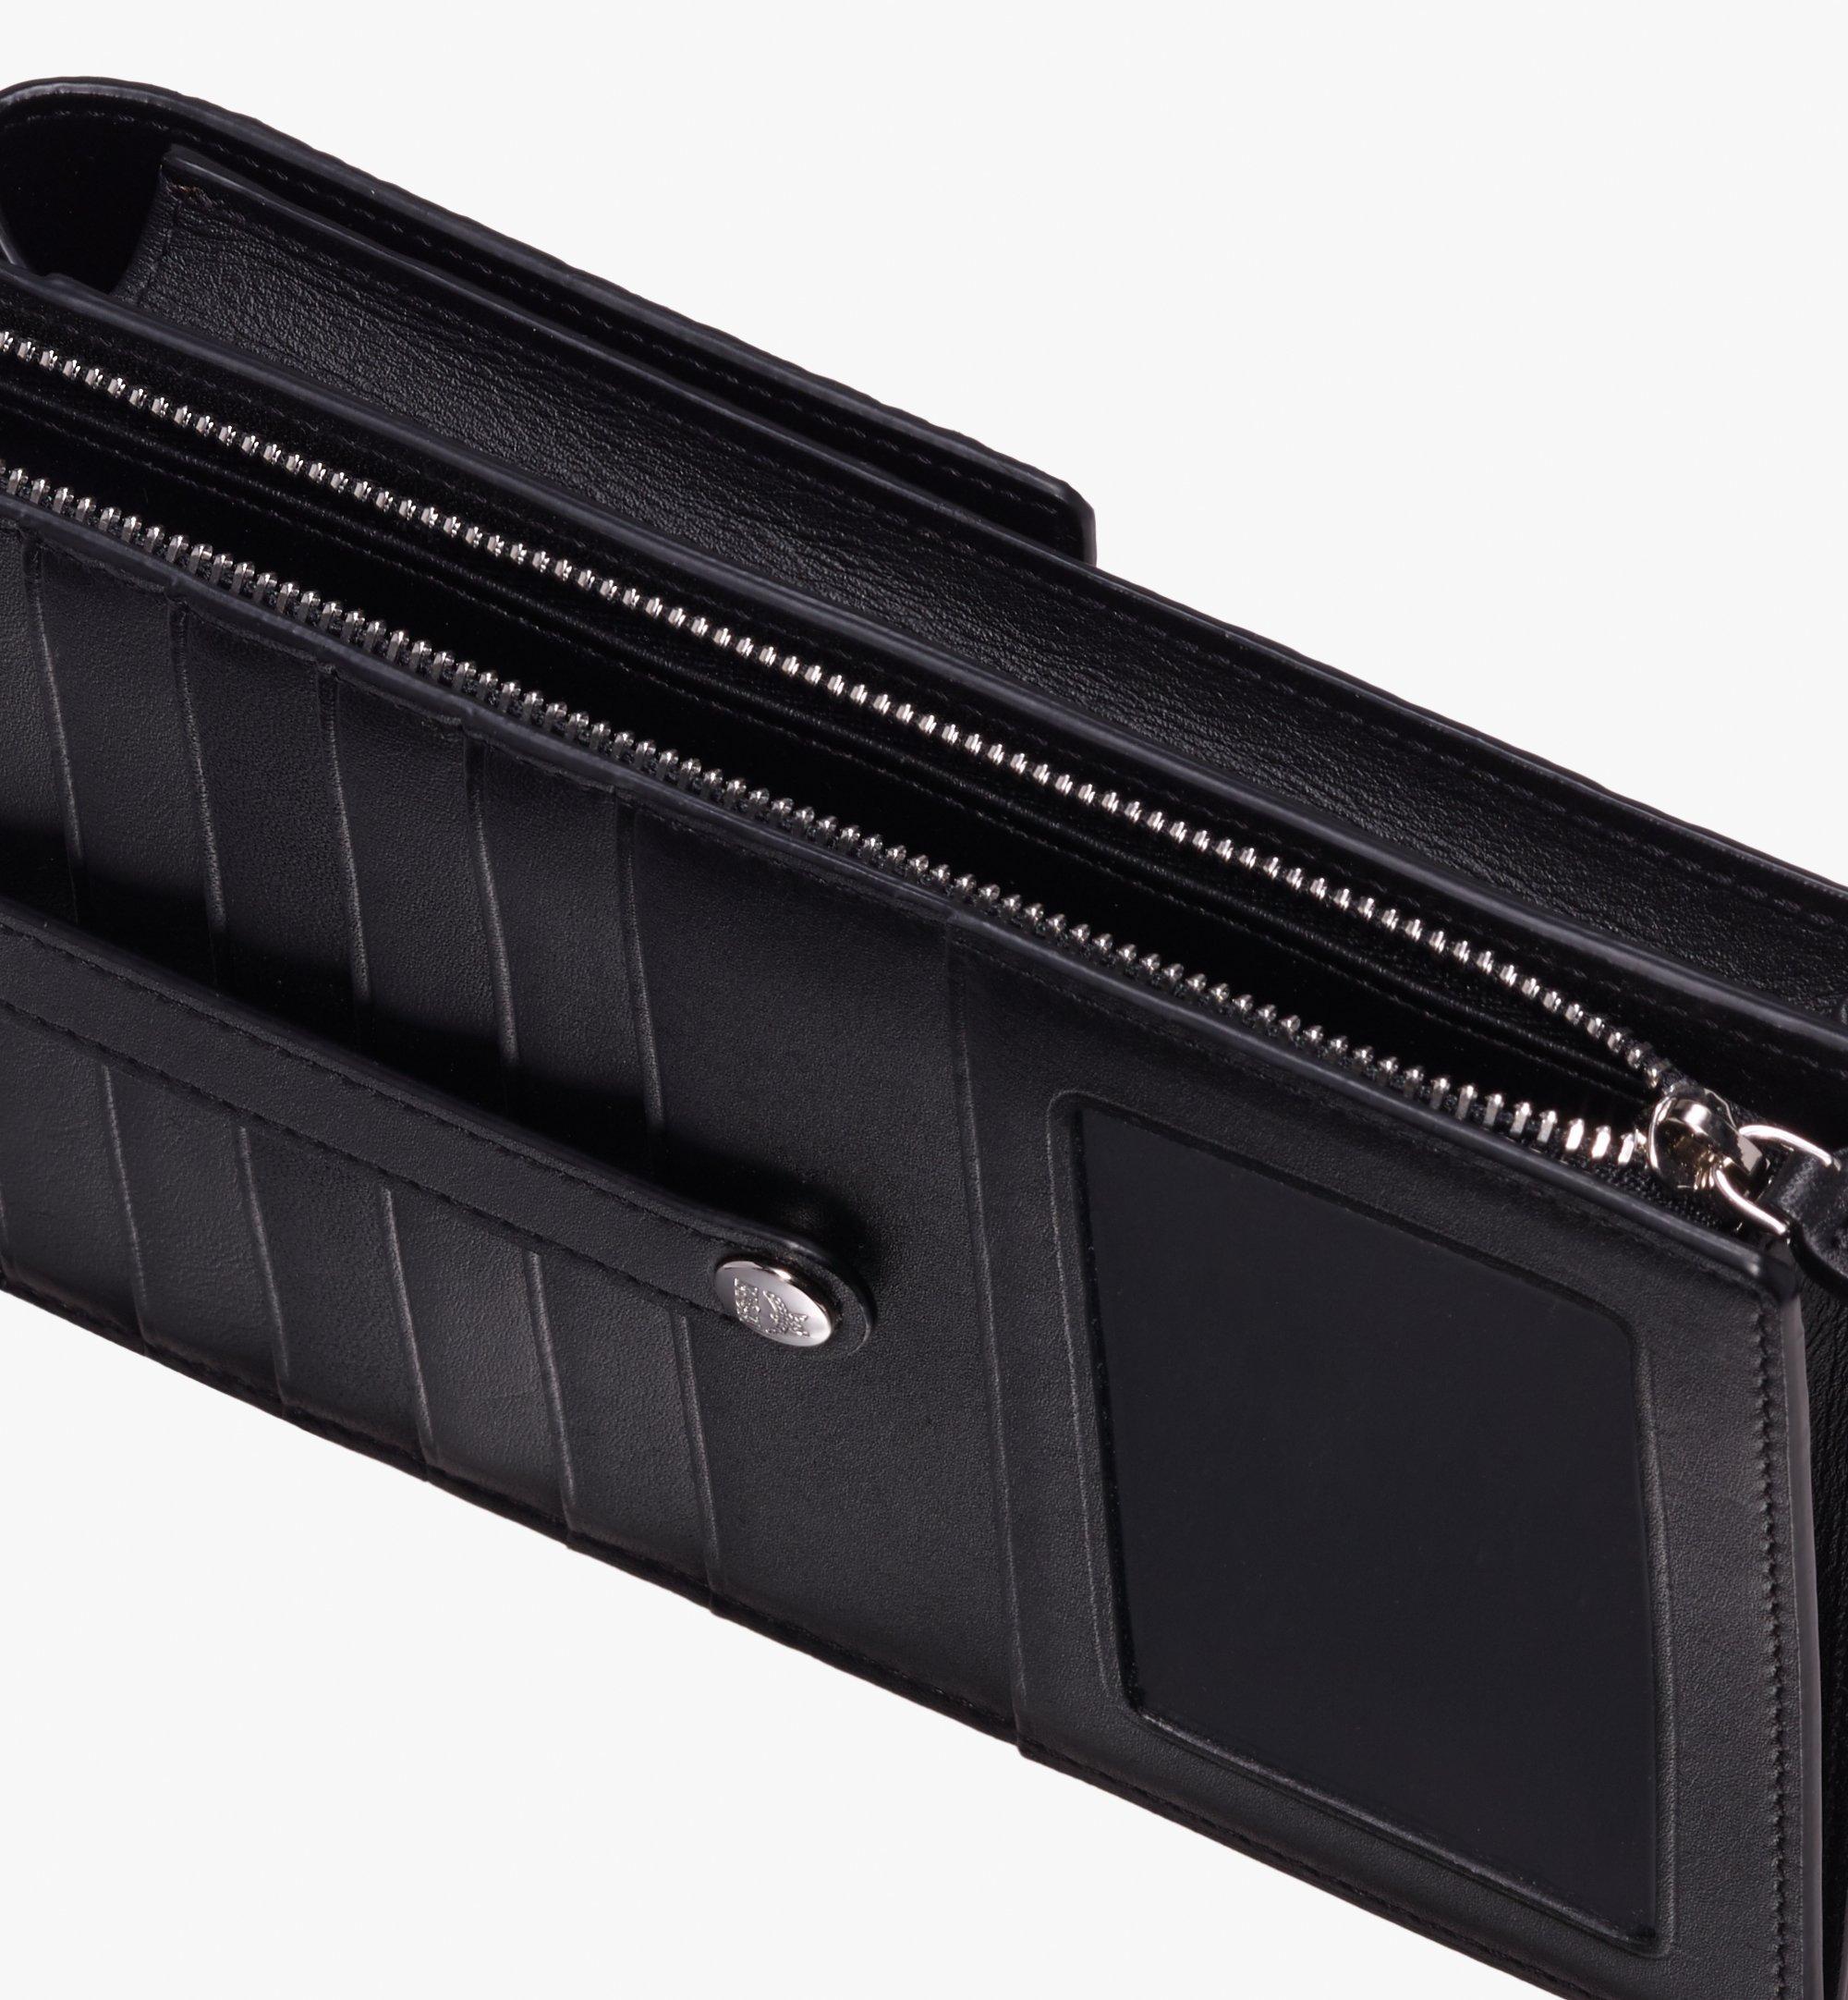 MCM Crossbody Phone Case in Visetos Black MXZ9AVI54BK001 Alternate View 2